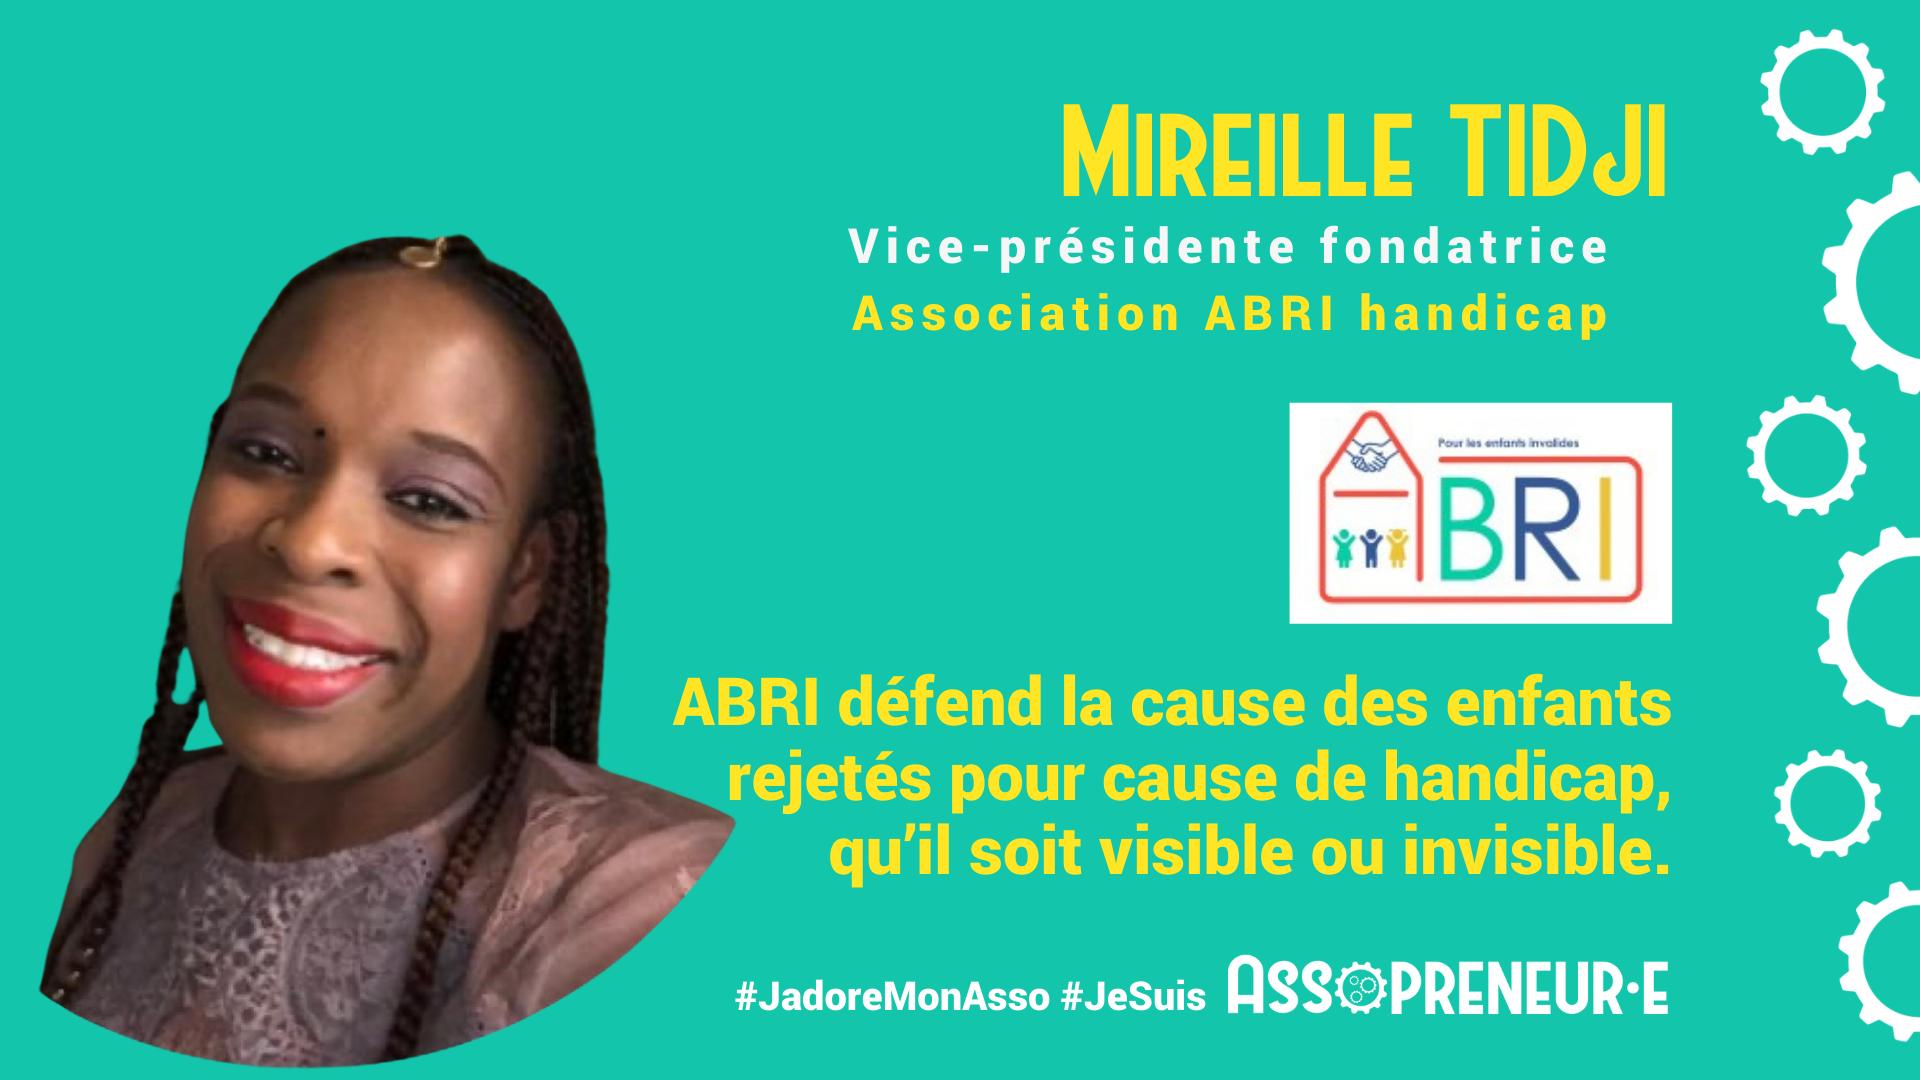 Mireille TIDJI membre programme Assopreneur